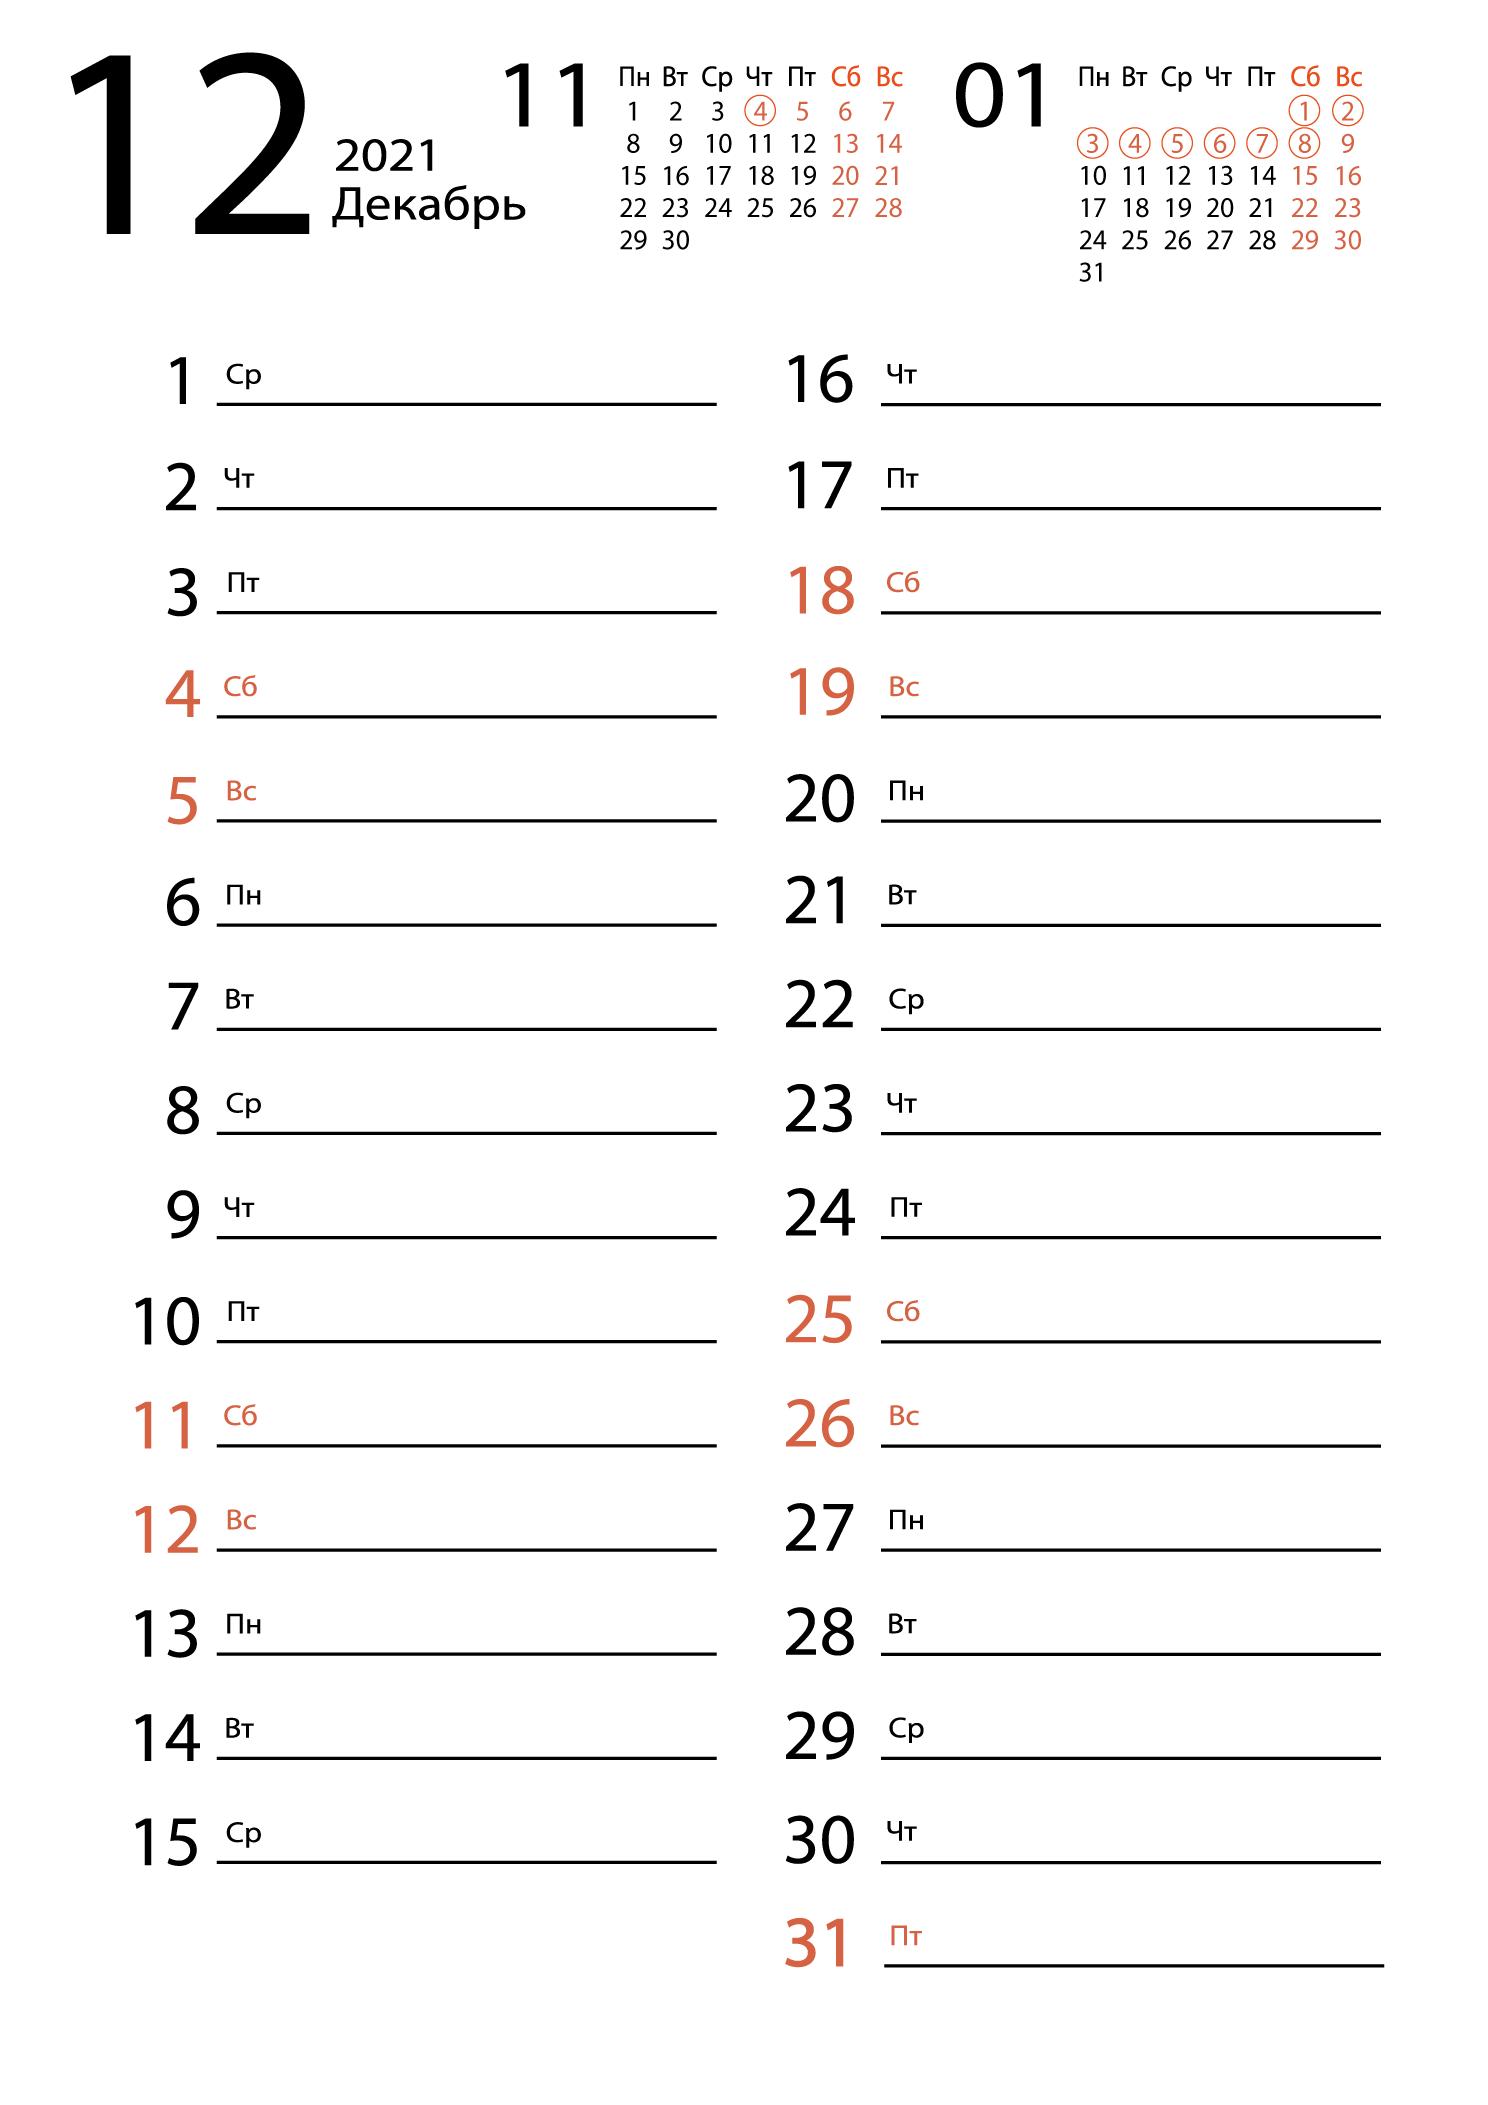 Календарь на декабрь 2021 (для заметок)